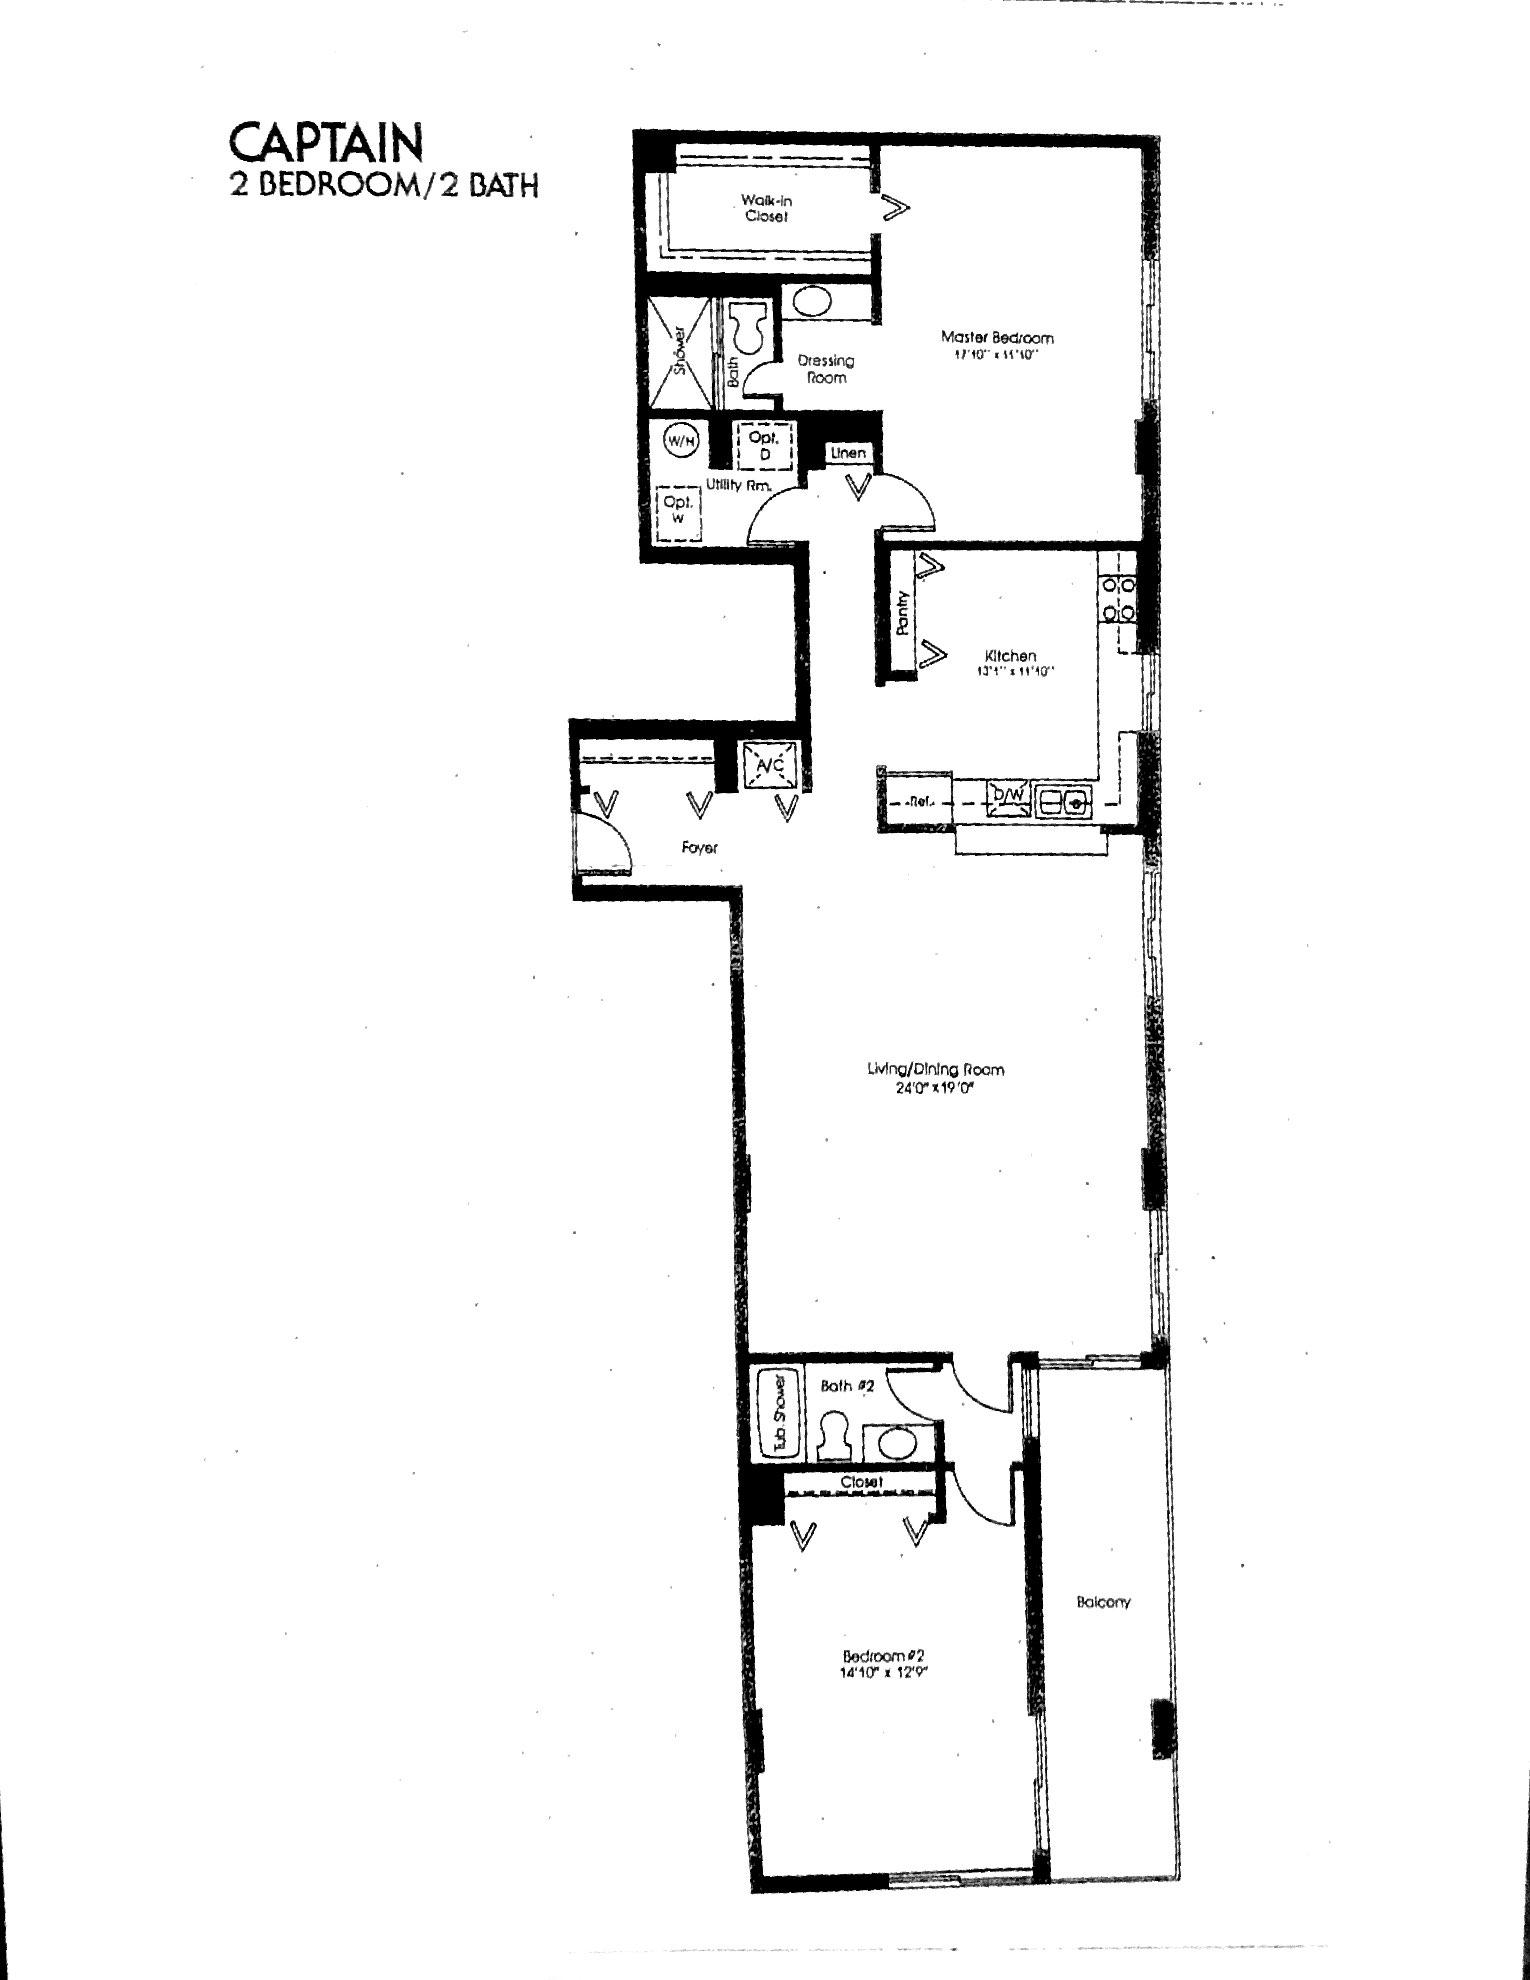 Coronado's Captain Floor Plan